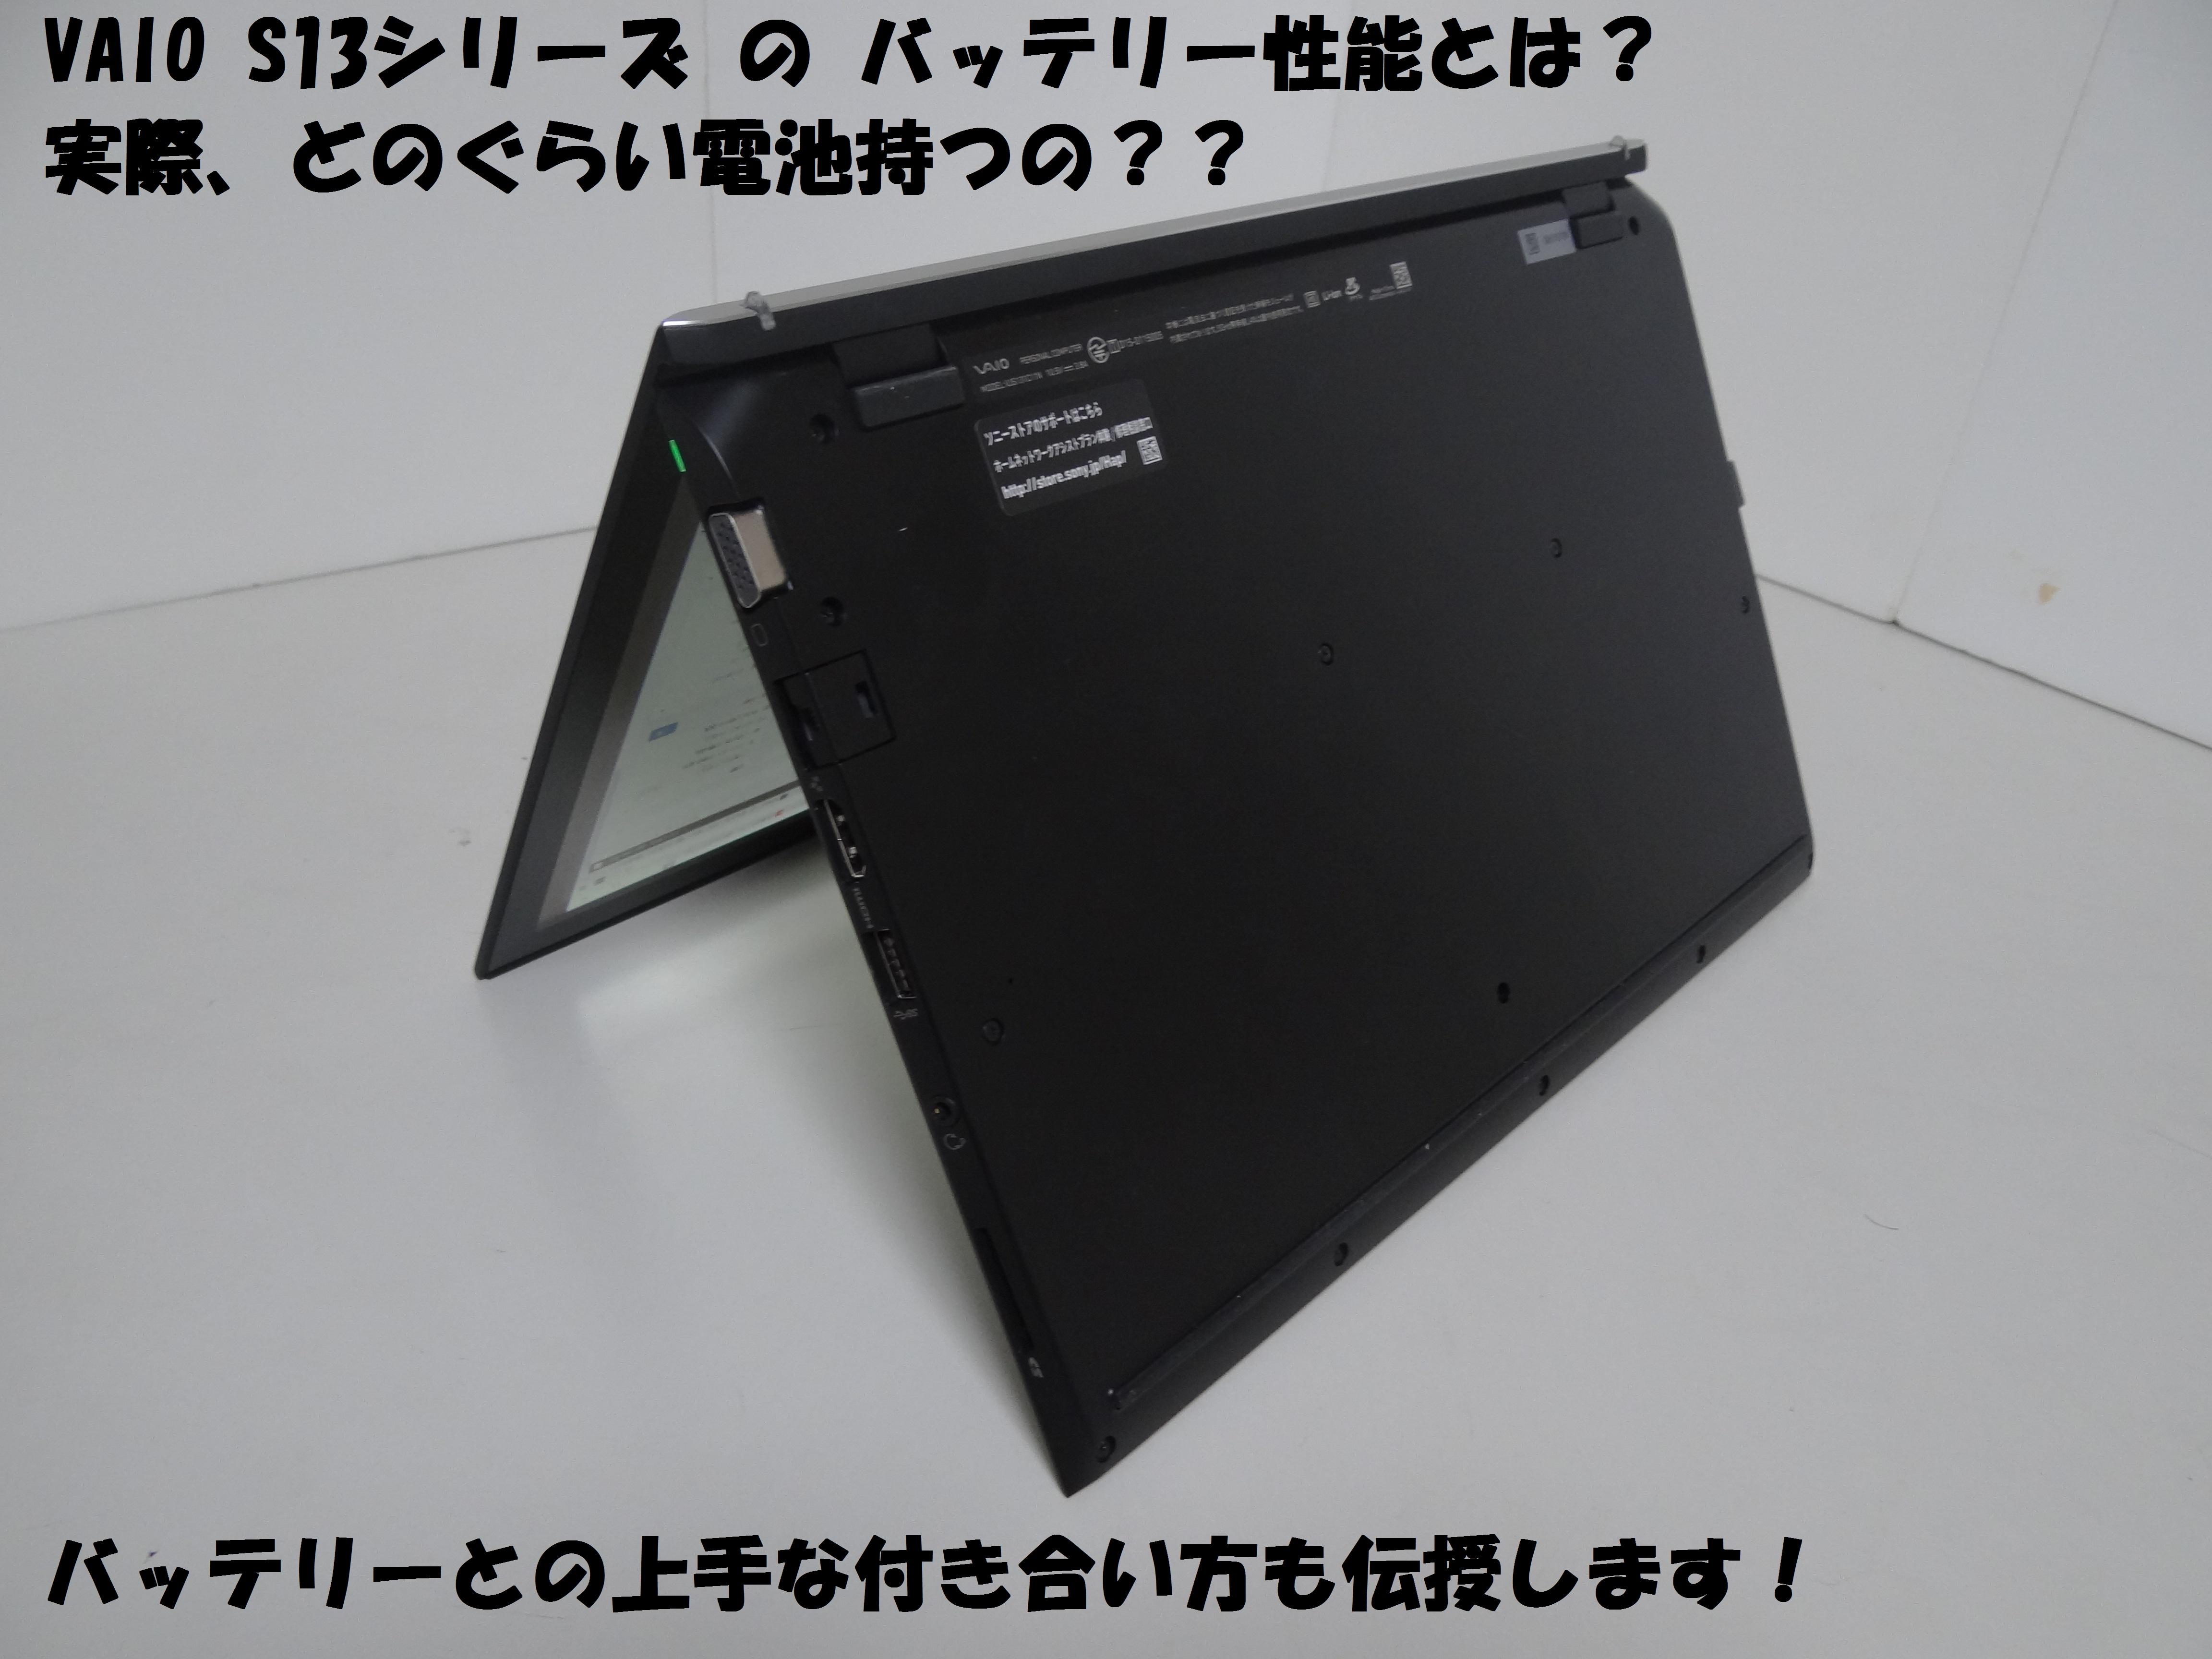 VAIO S13シリーズ